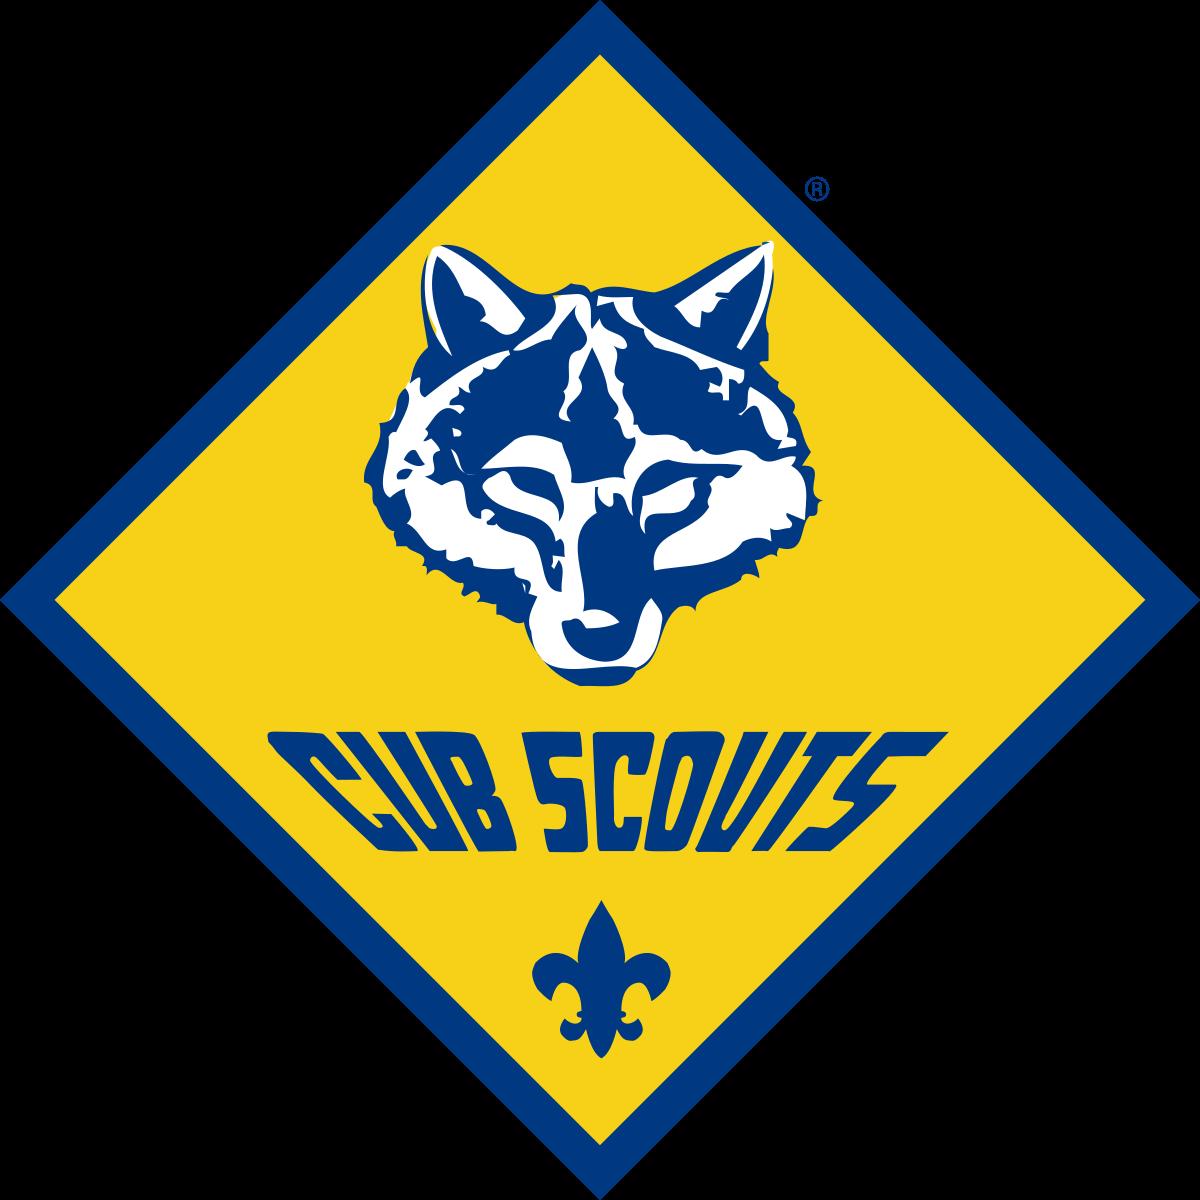 Cub Scouting (Boy Scouts of America).